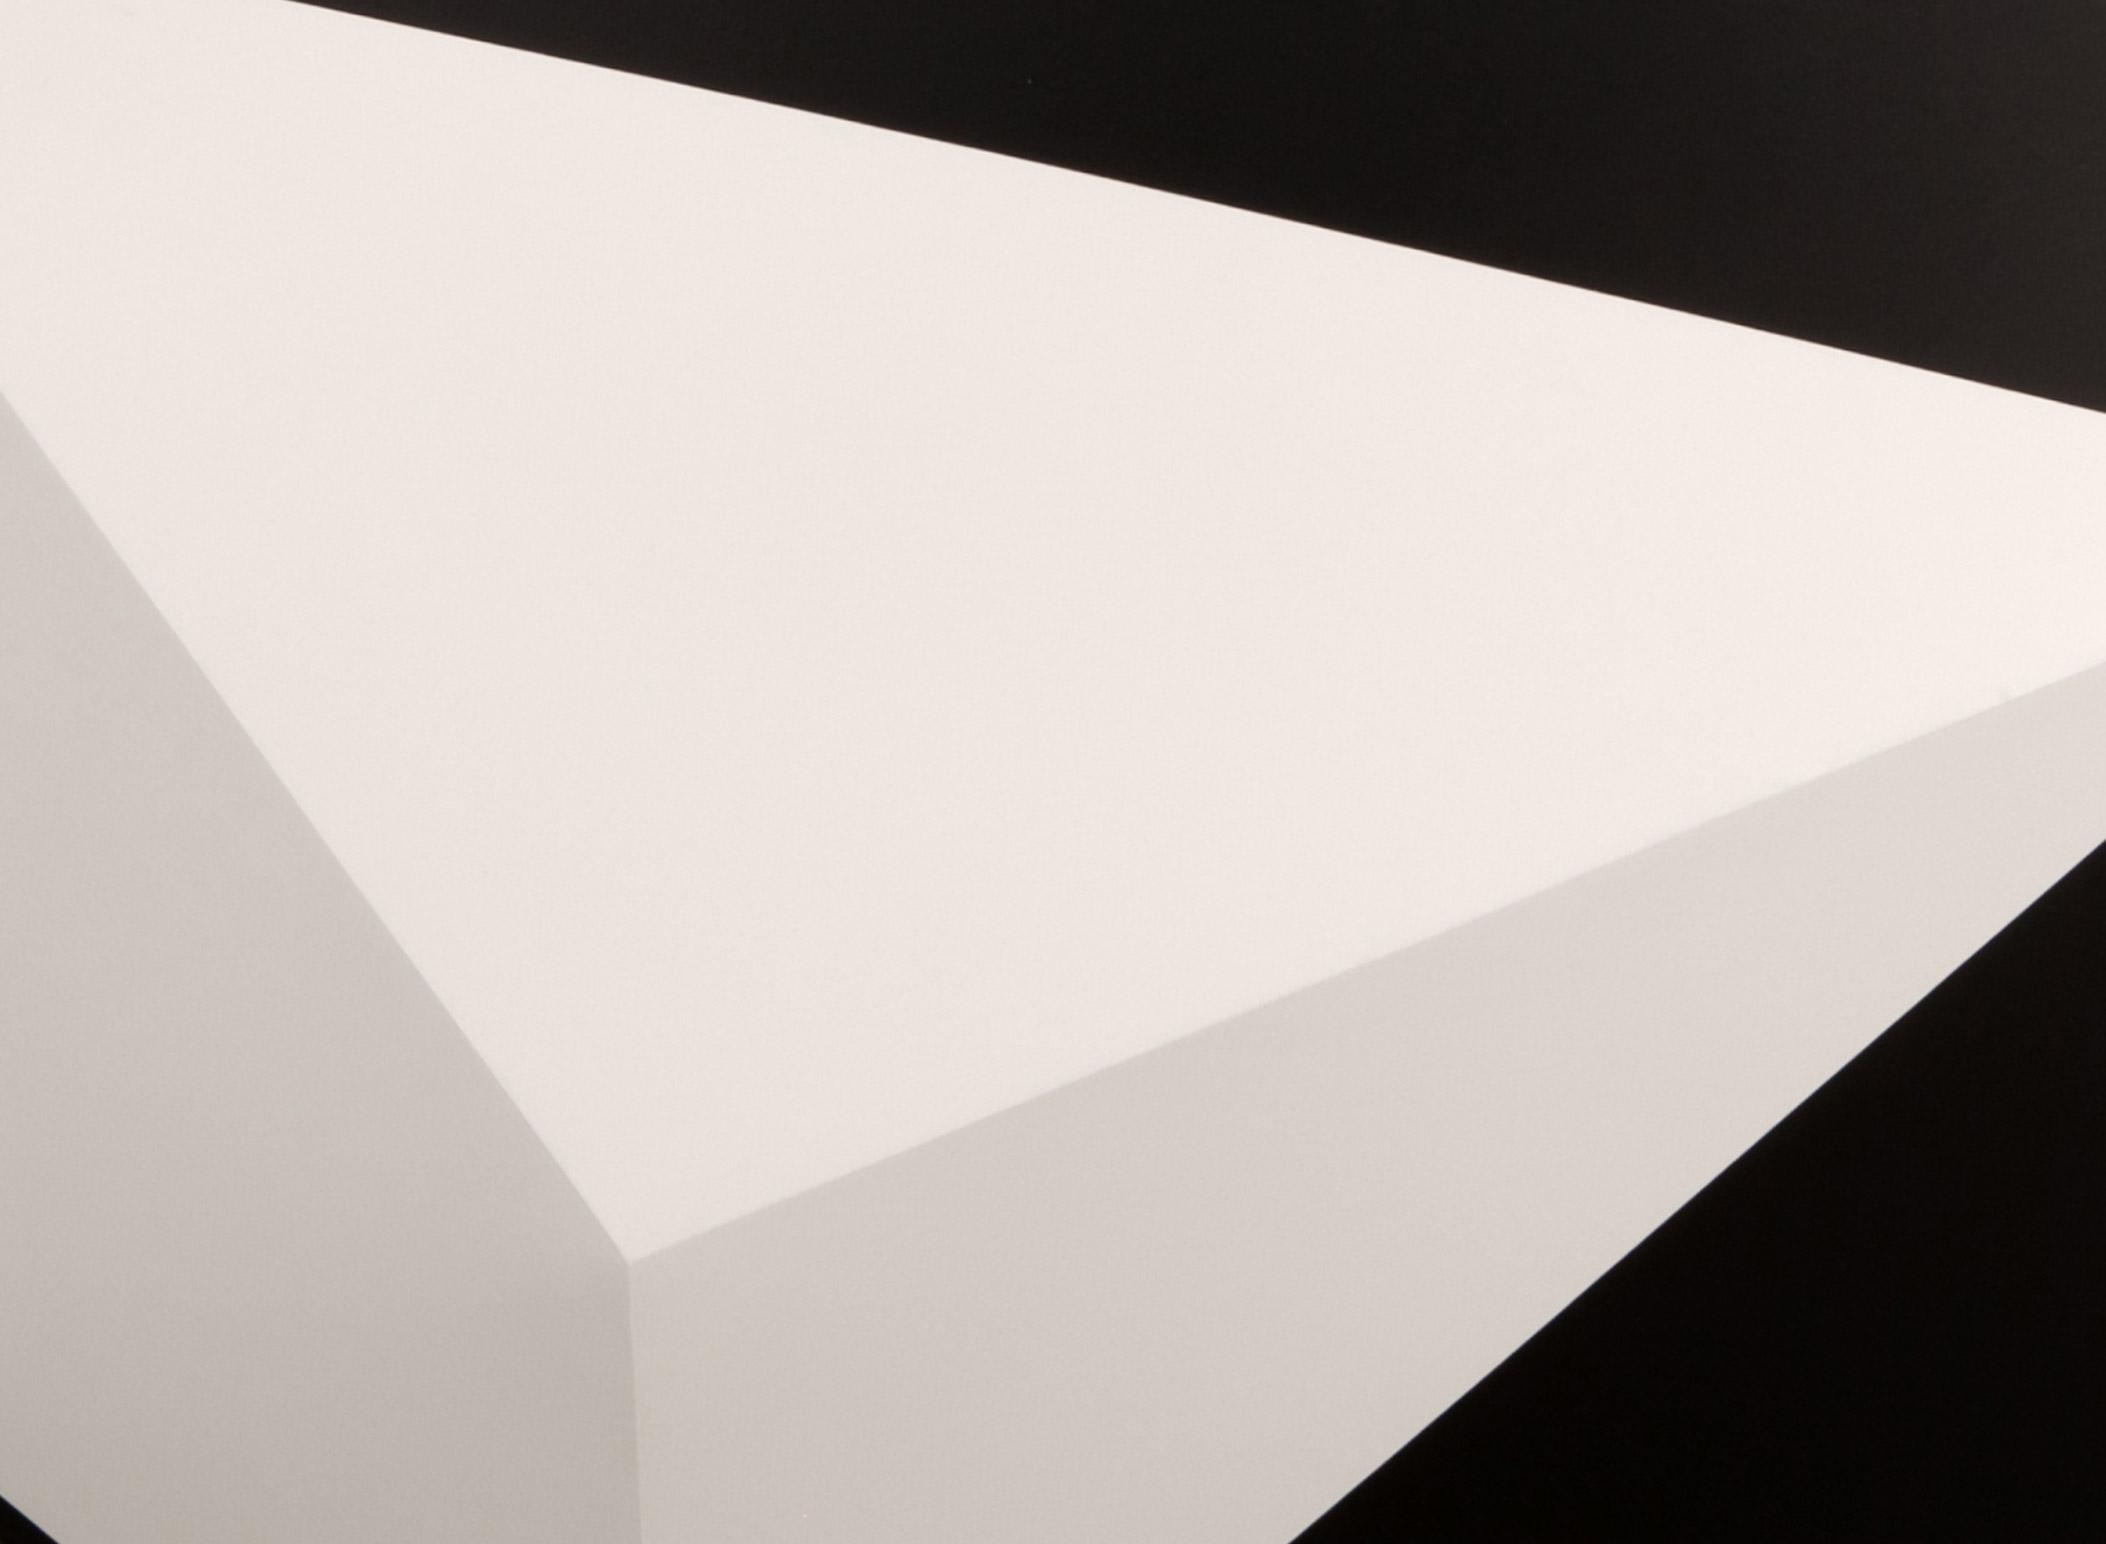 Untitled-BW-Detail.jpg